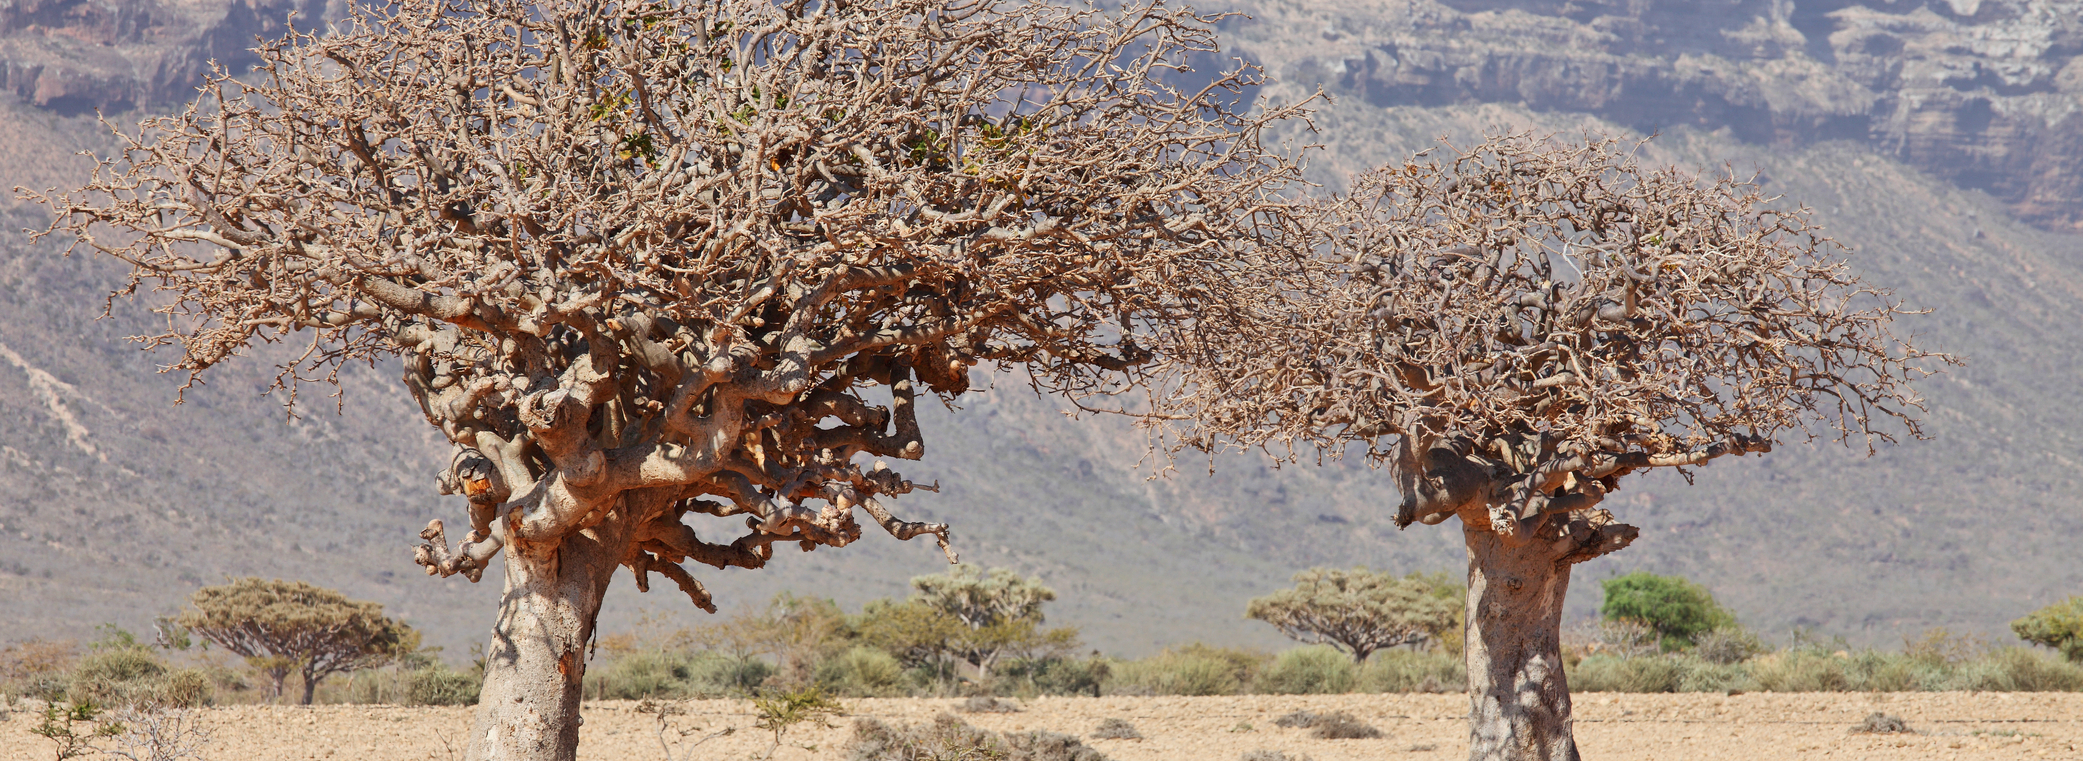 Trees with myrrh growing.